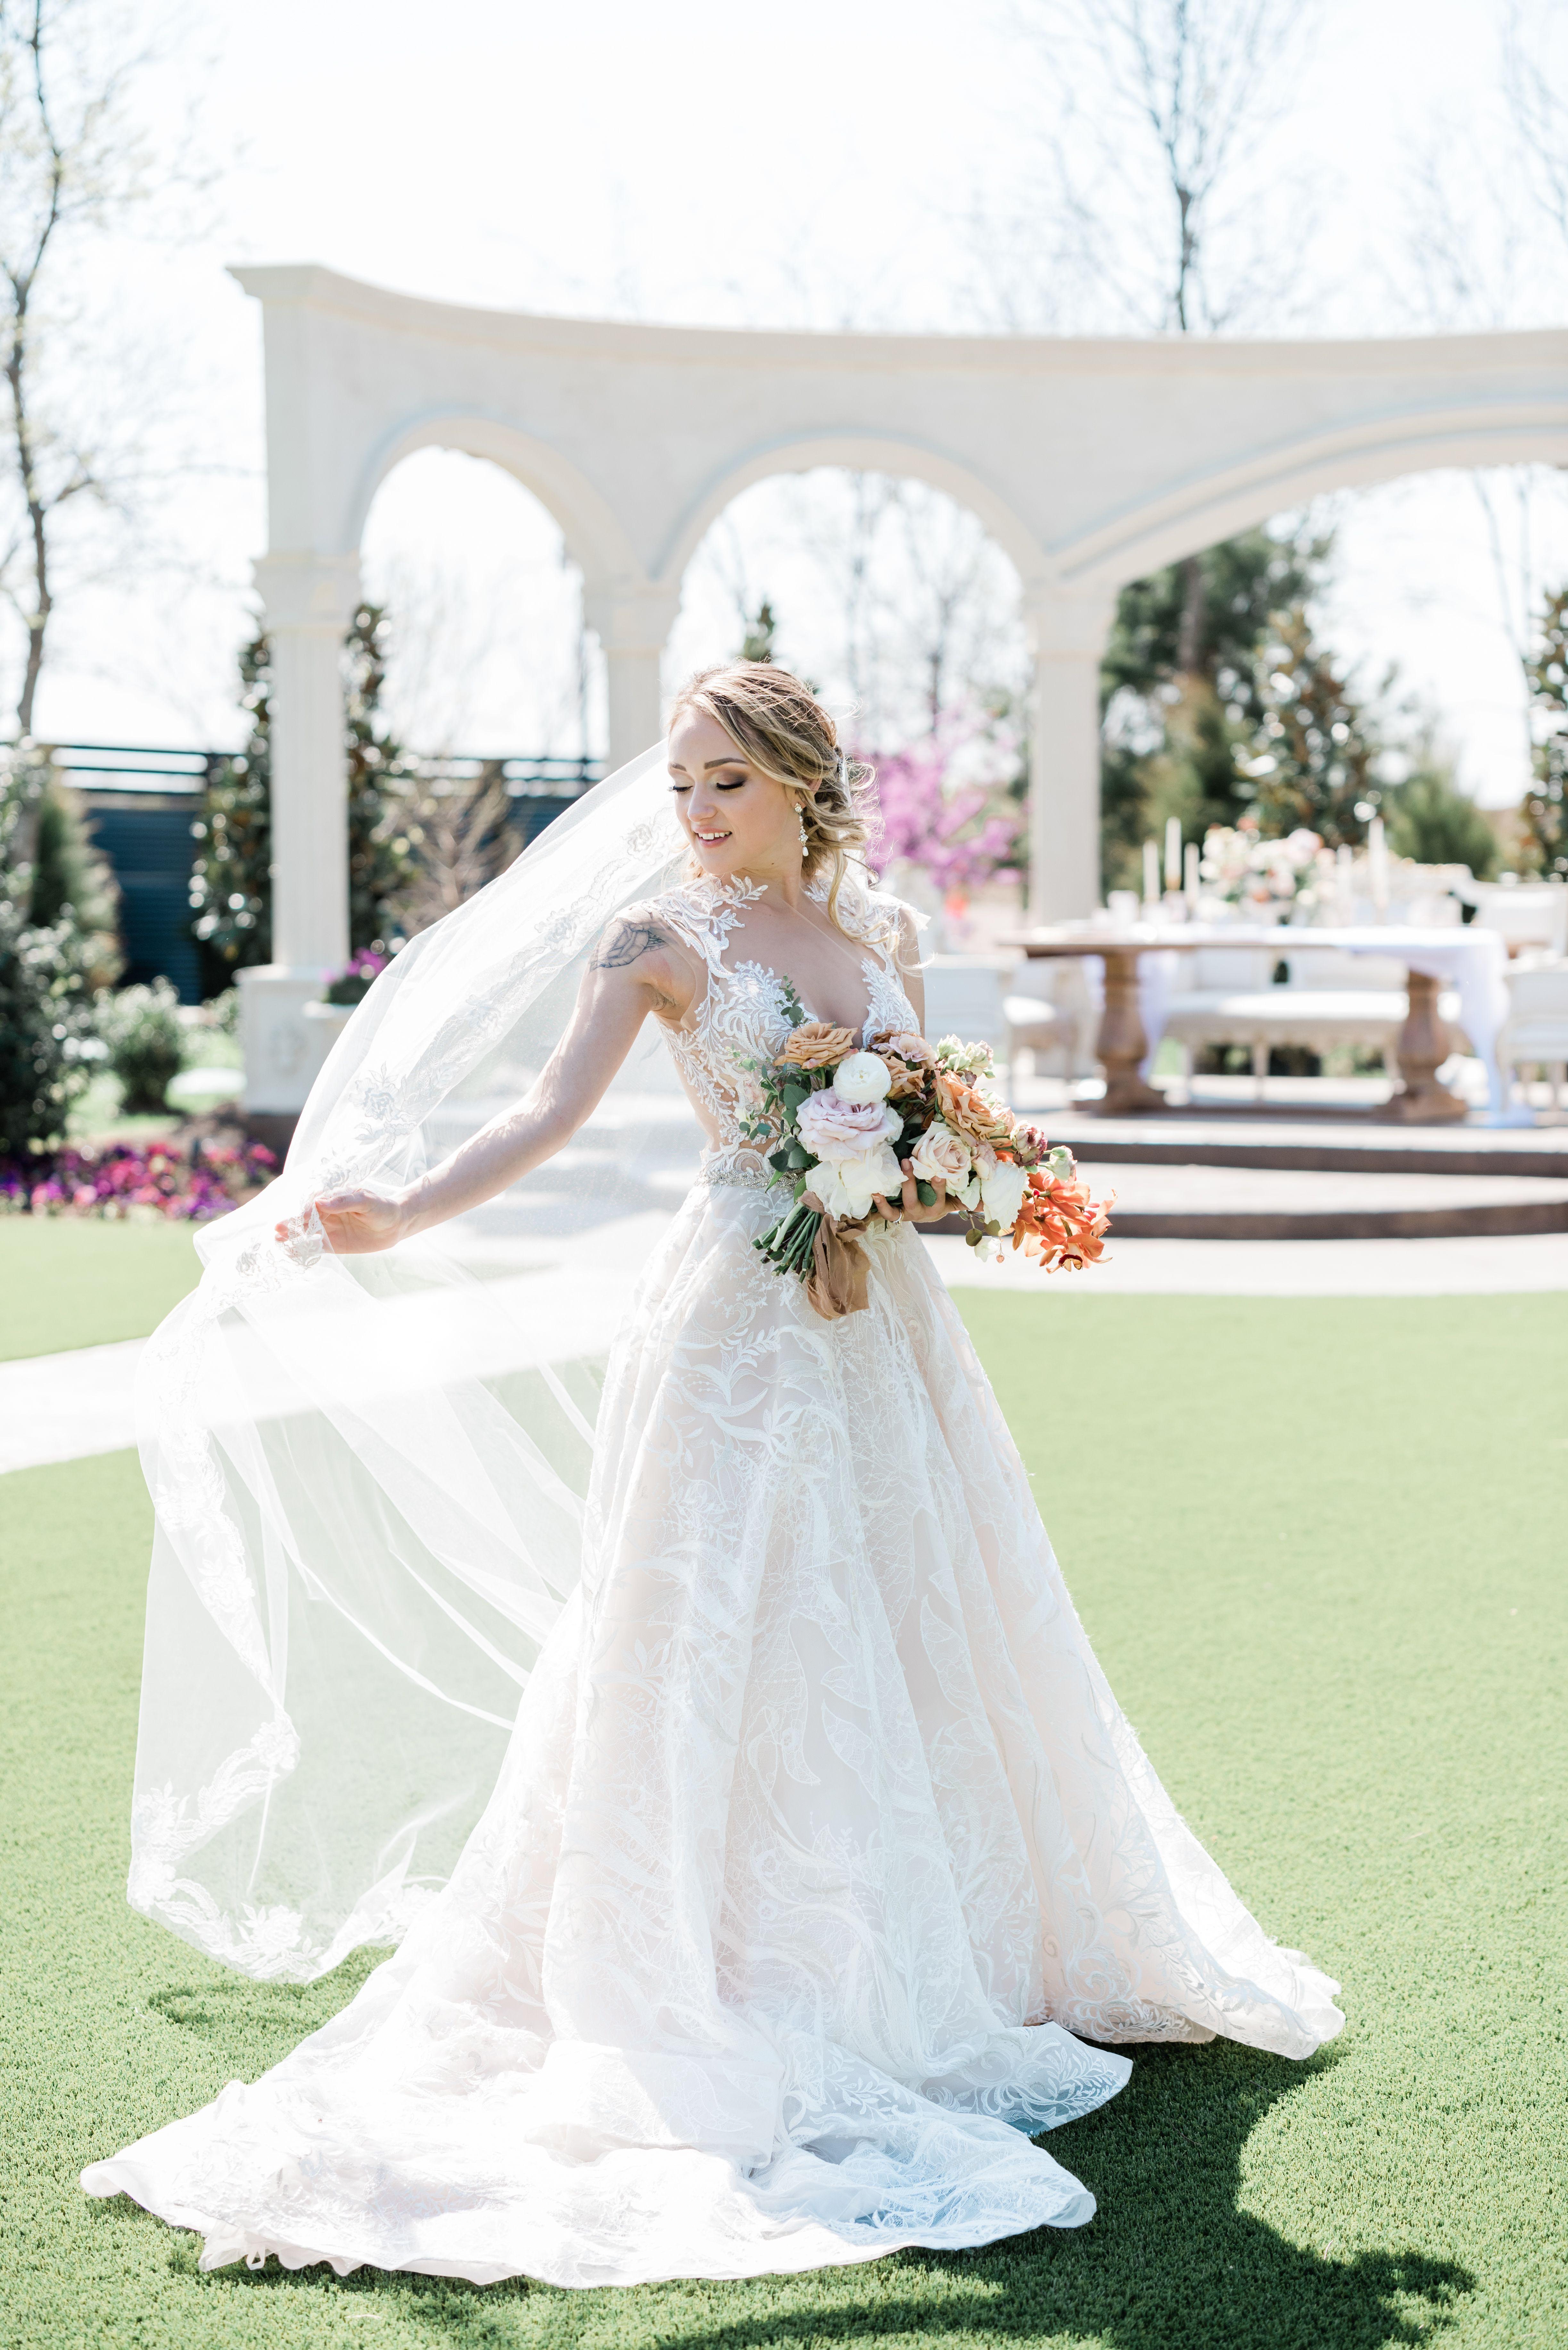 Royal Wedding Princess Bridal Gown Princess Bridal Gown Princess Wedding Bridal Gowns [ 7333 x 4894 Pixel ]